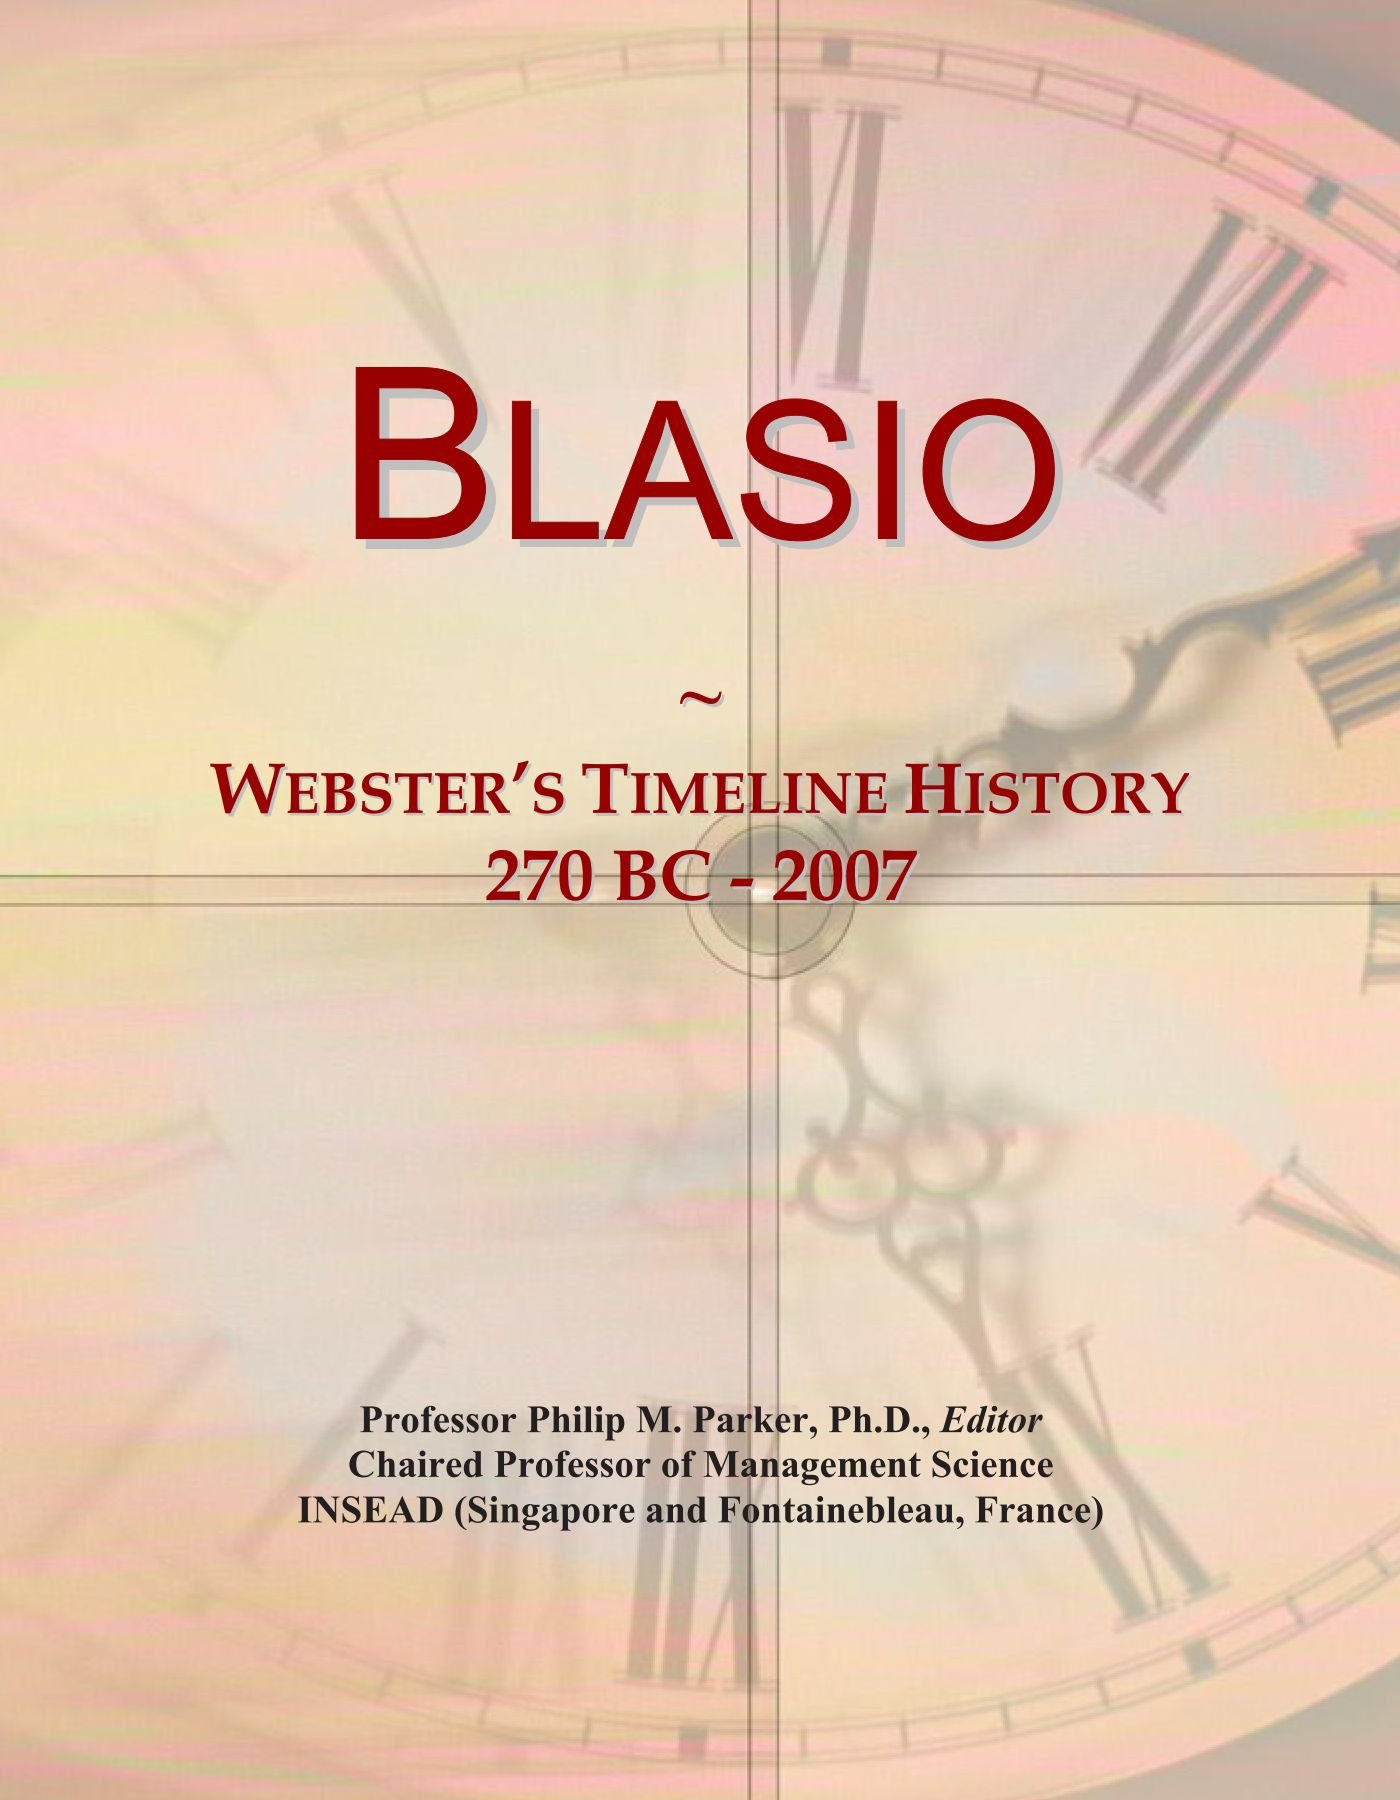 Download Blasio: Webster's Timeline History, 270 BC - 2007 ebook